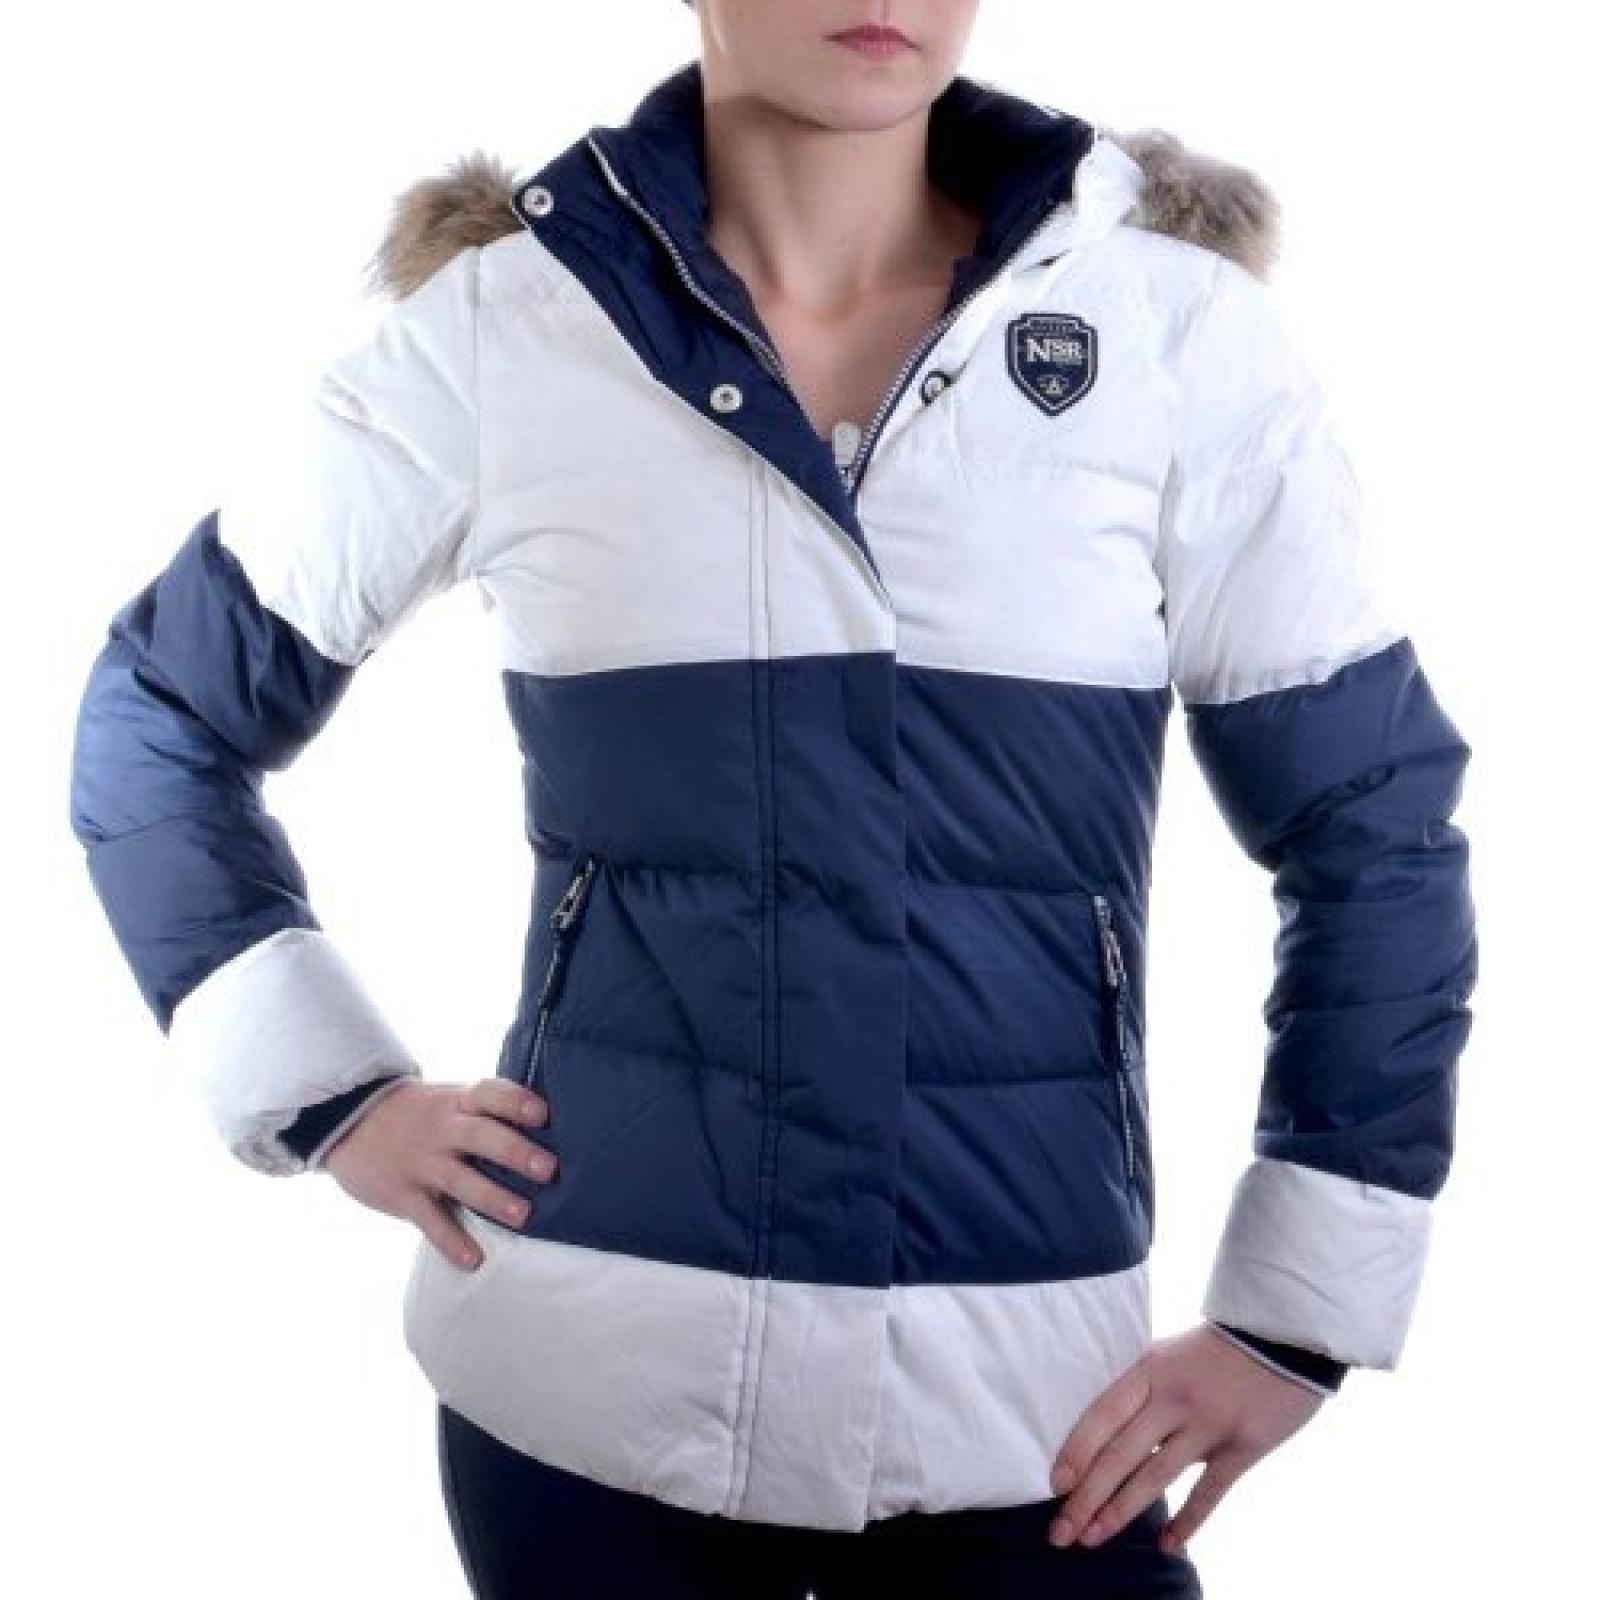 Gaastra Damenjacke Icestorm Gr. XL UVP 339,95 Euro 36127032 Creme 338 Damen Jacke